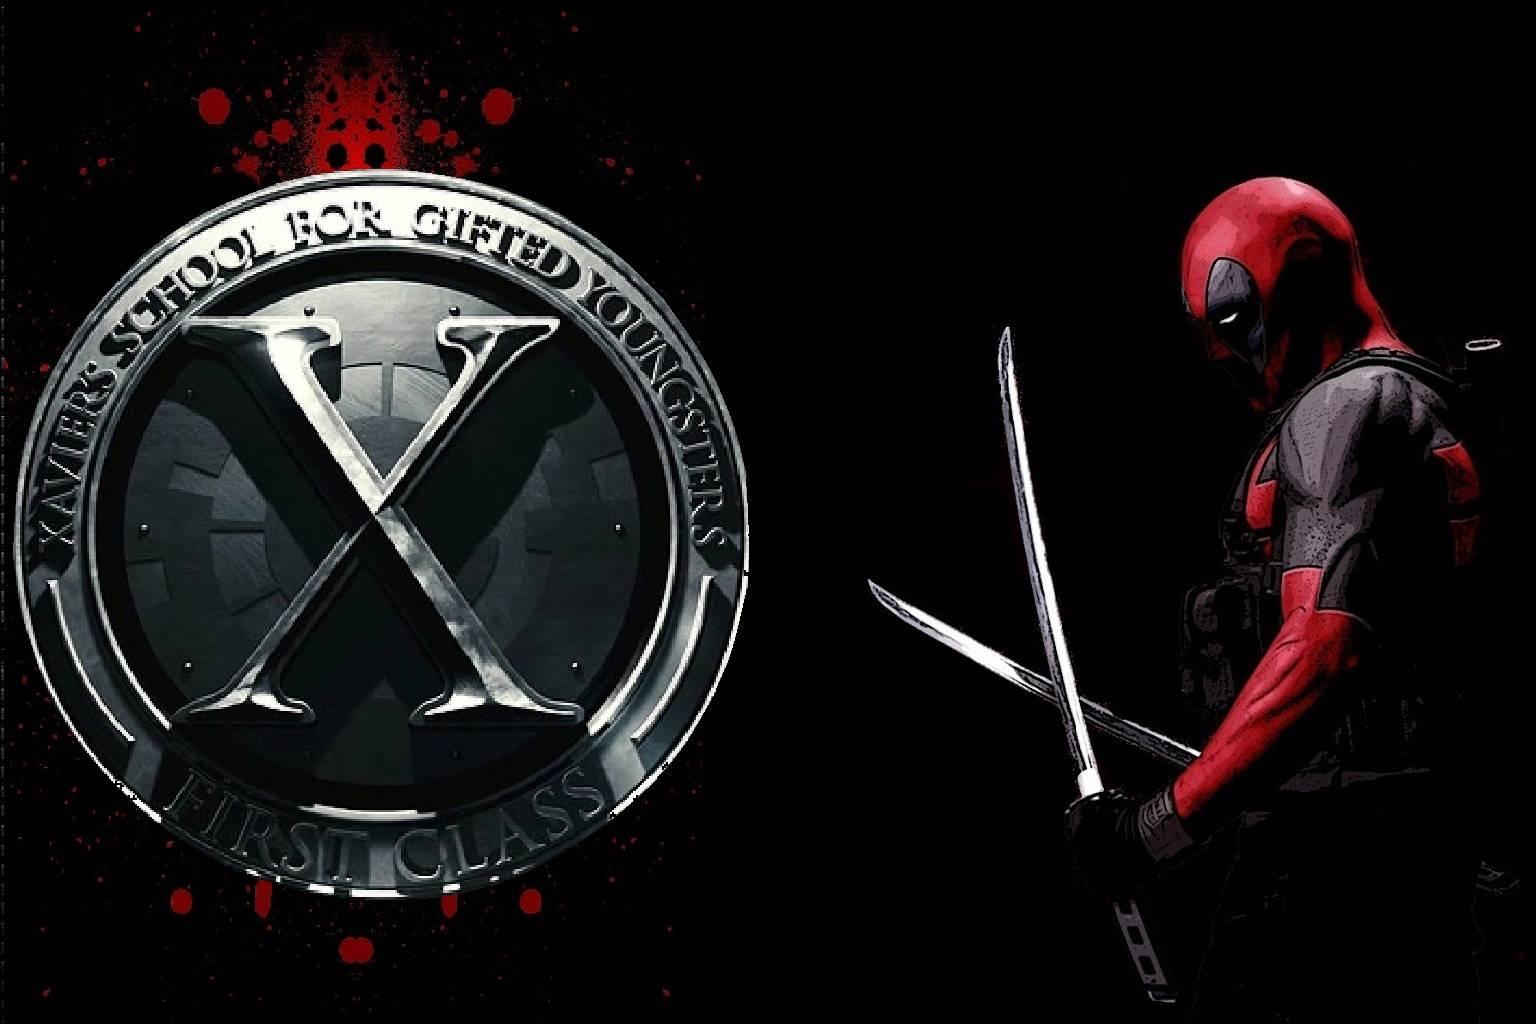 Deadpool and Xmen